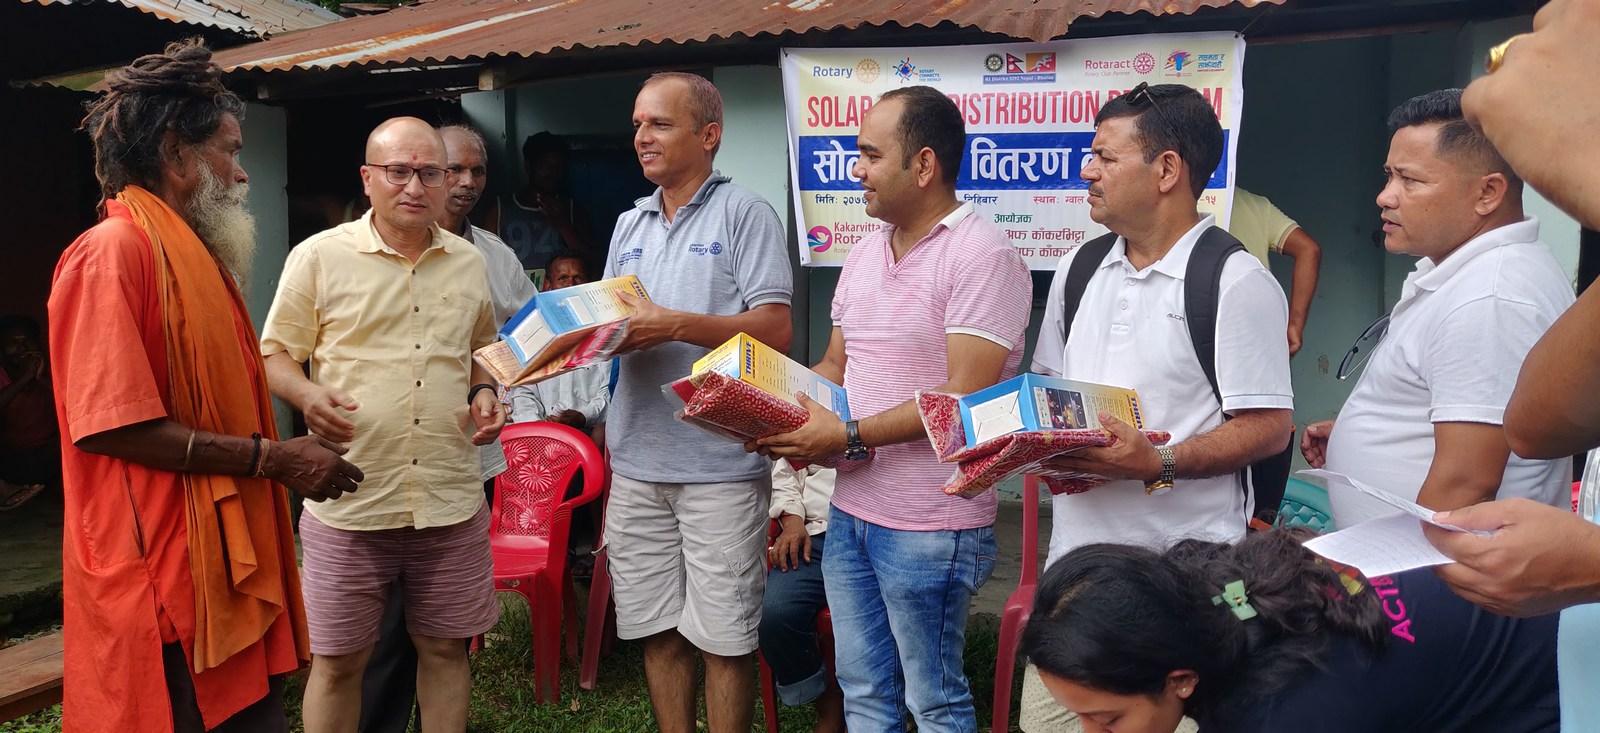 Solar-Light-Distribution-Program-Rotary-Club-of-Kakarvitta-27